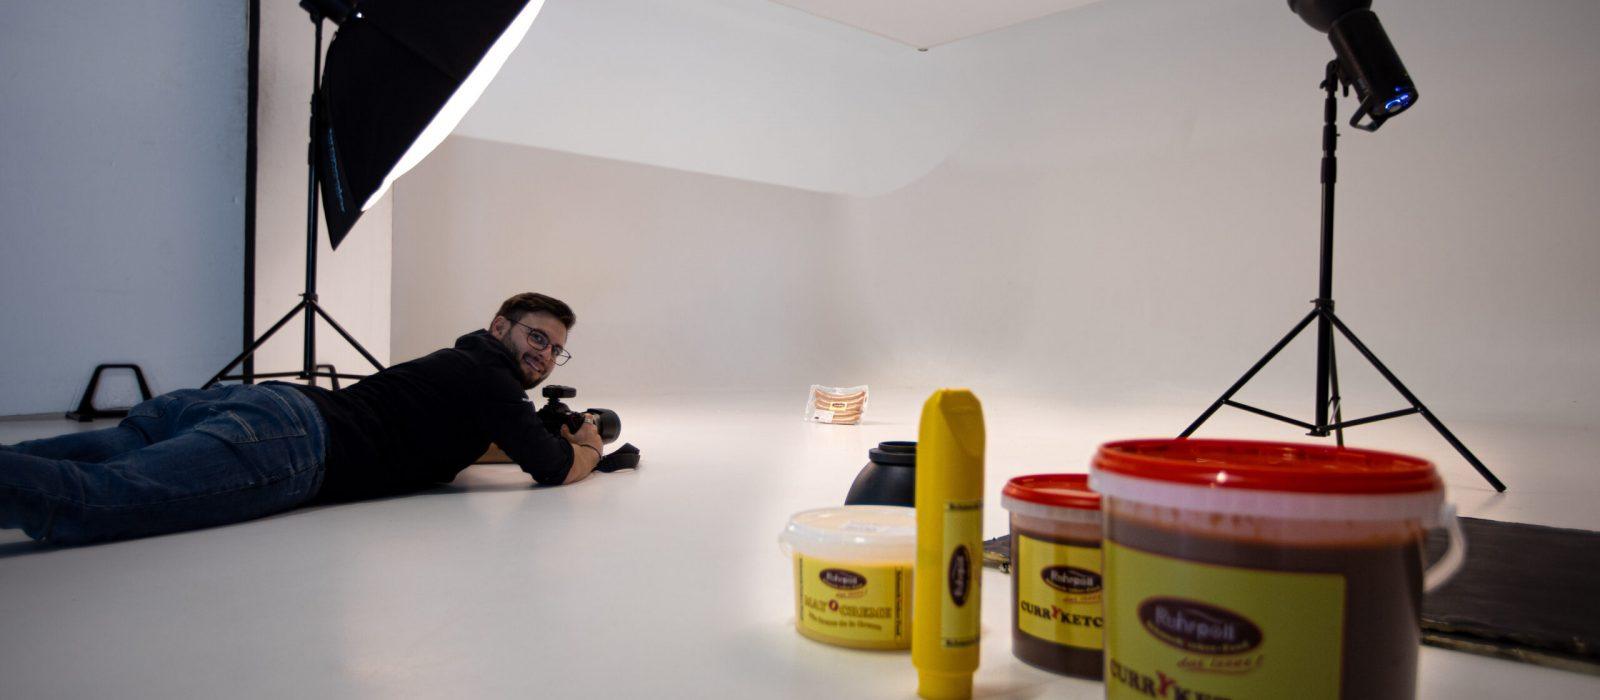 Ruhrpott Schmecklecker-Food - Foto: Gruppe C Photography